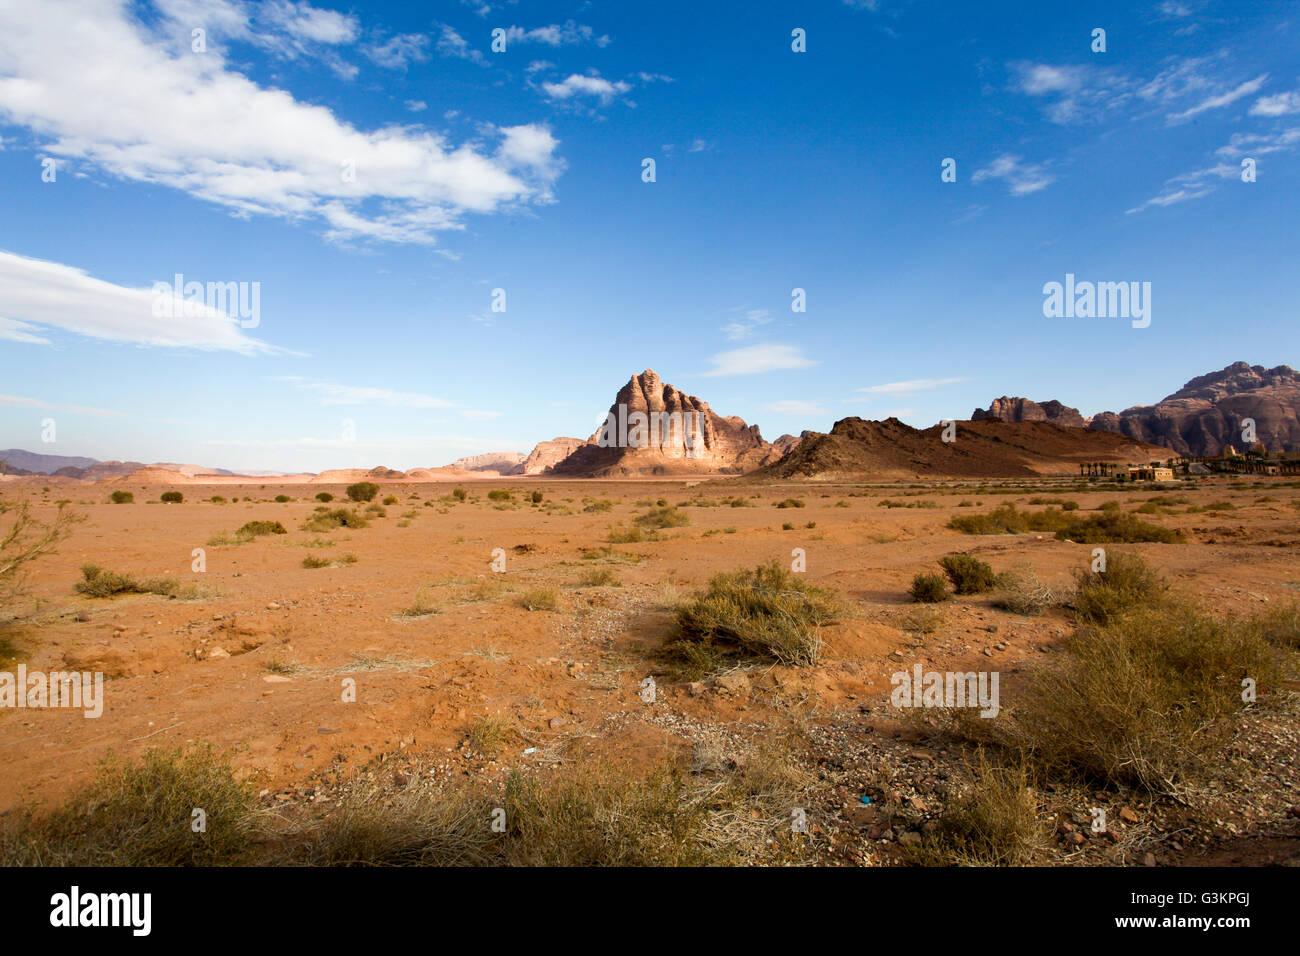 Paisaje desértico, Wadi Rum, Jordania Imagen De Stock